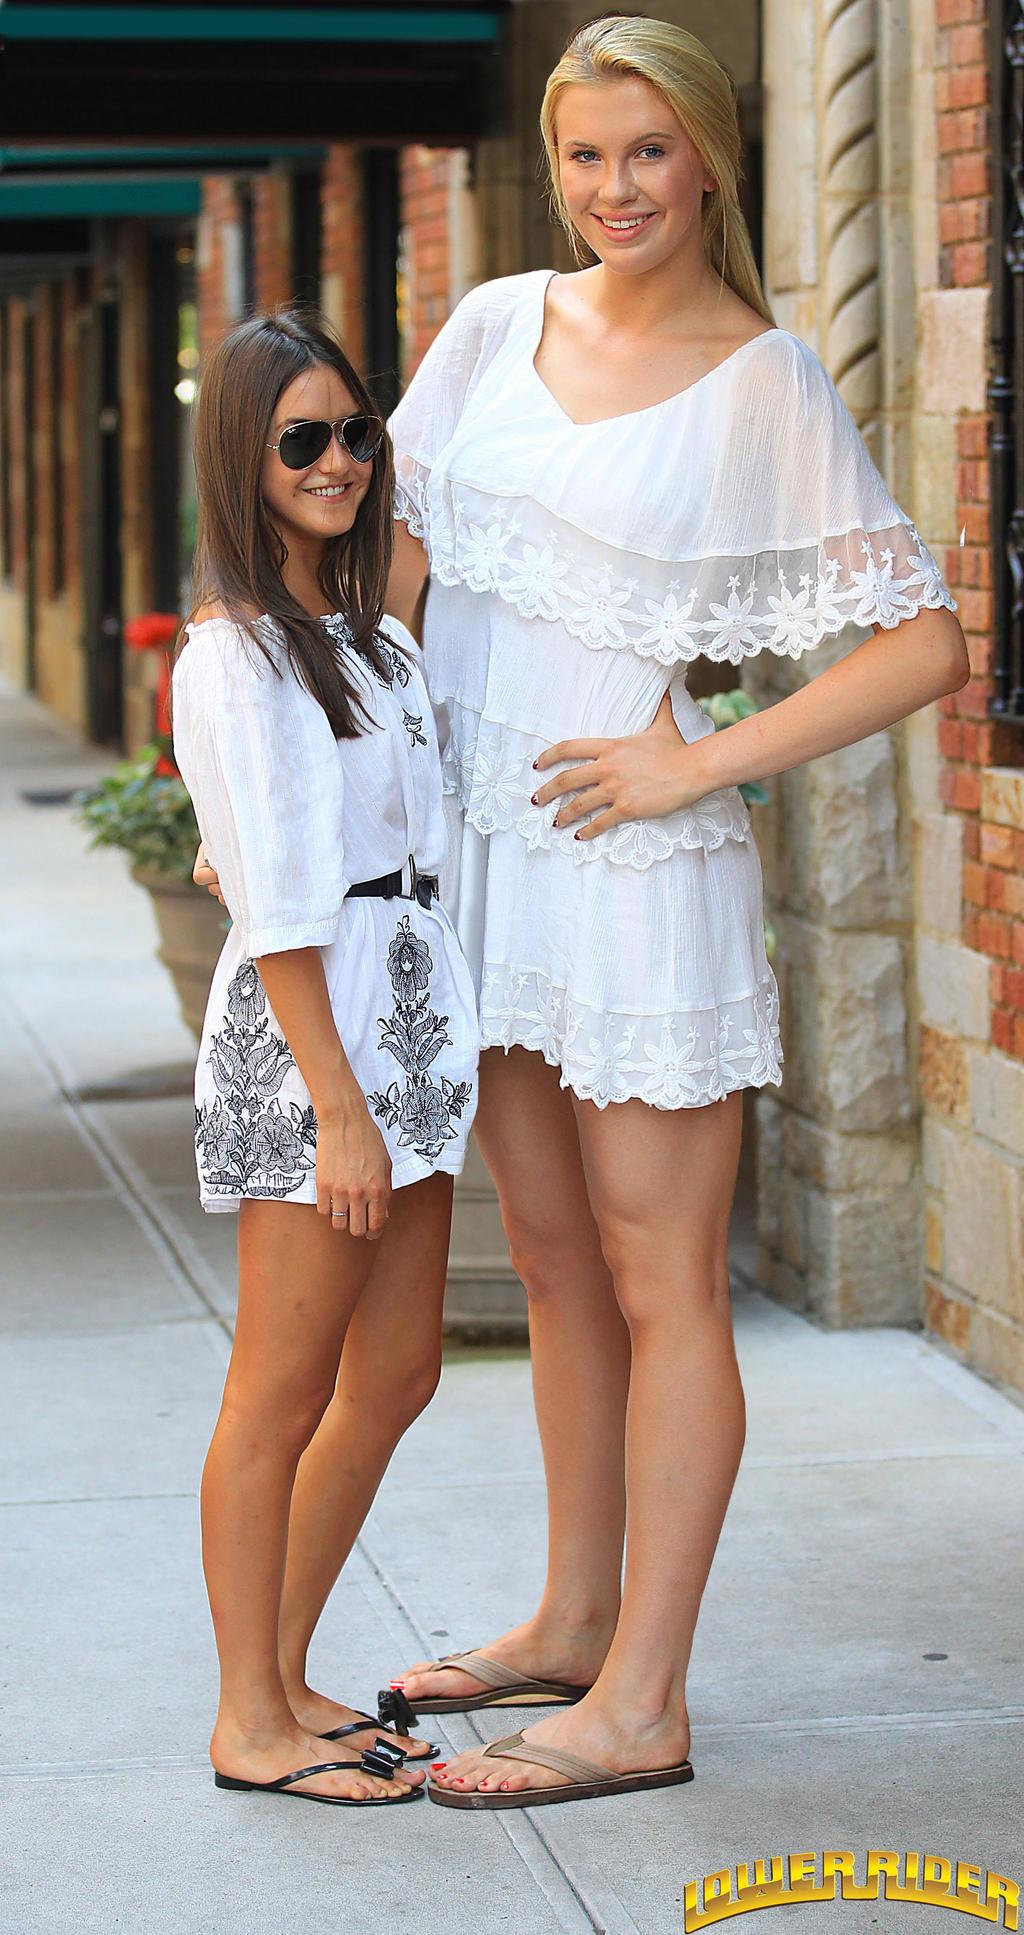 Megan Midget men to date taller women she